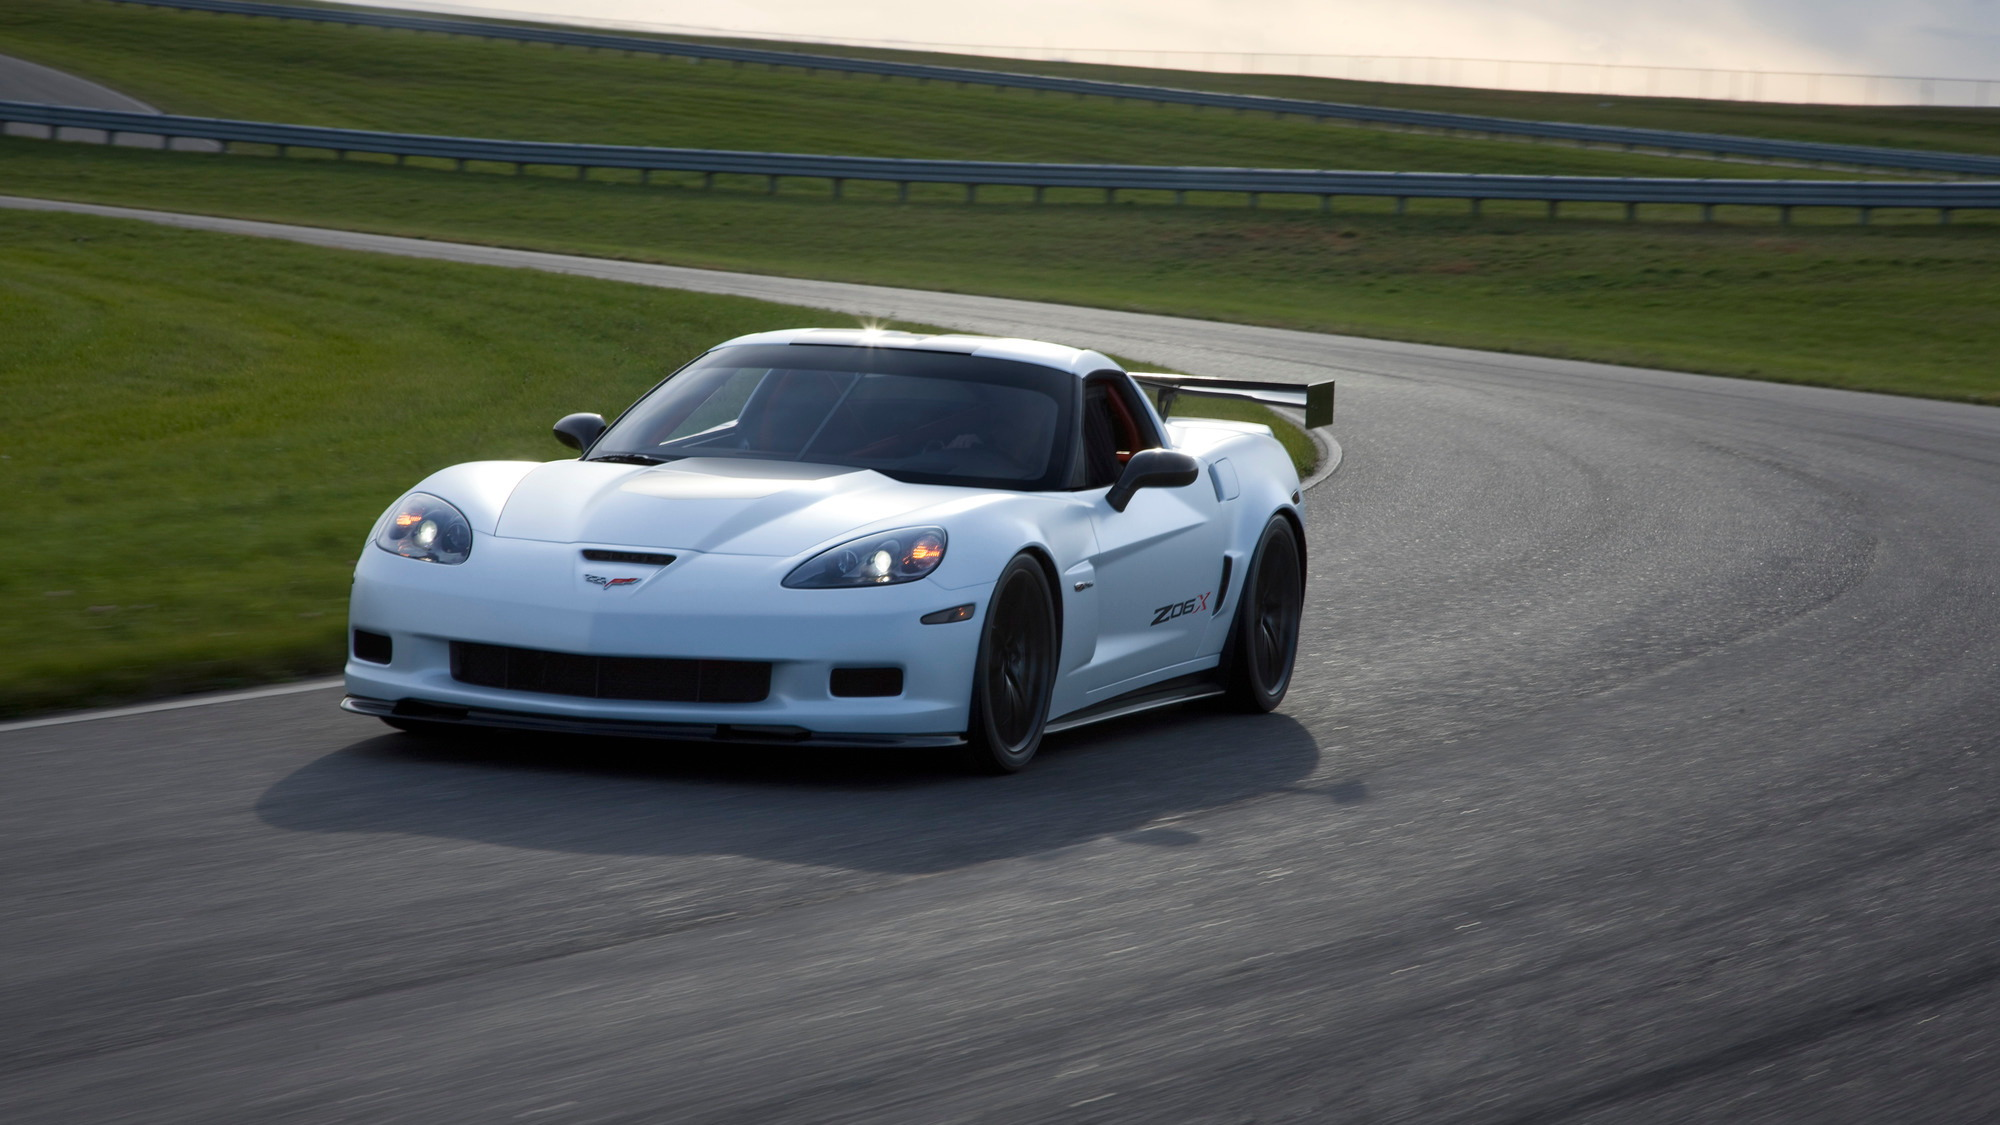 2011 Chevrolet Corvette Z06X Track Car Concept